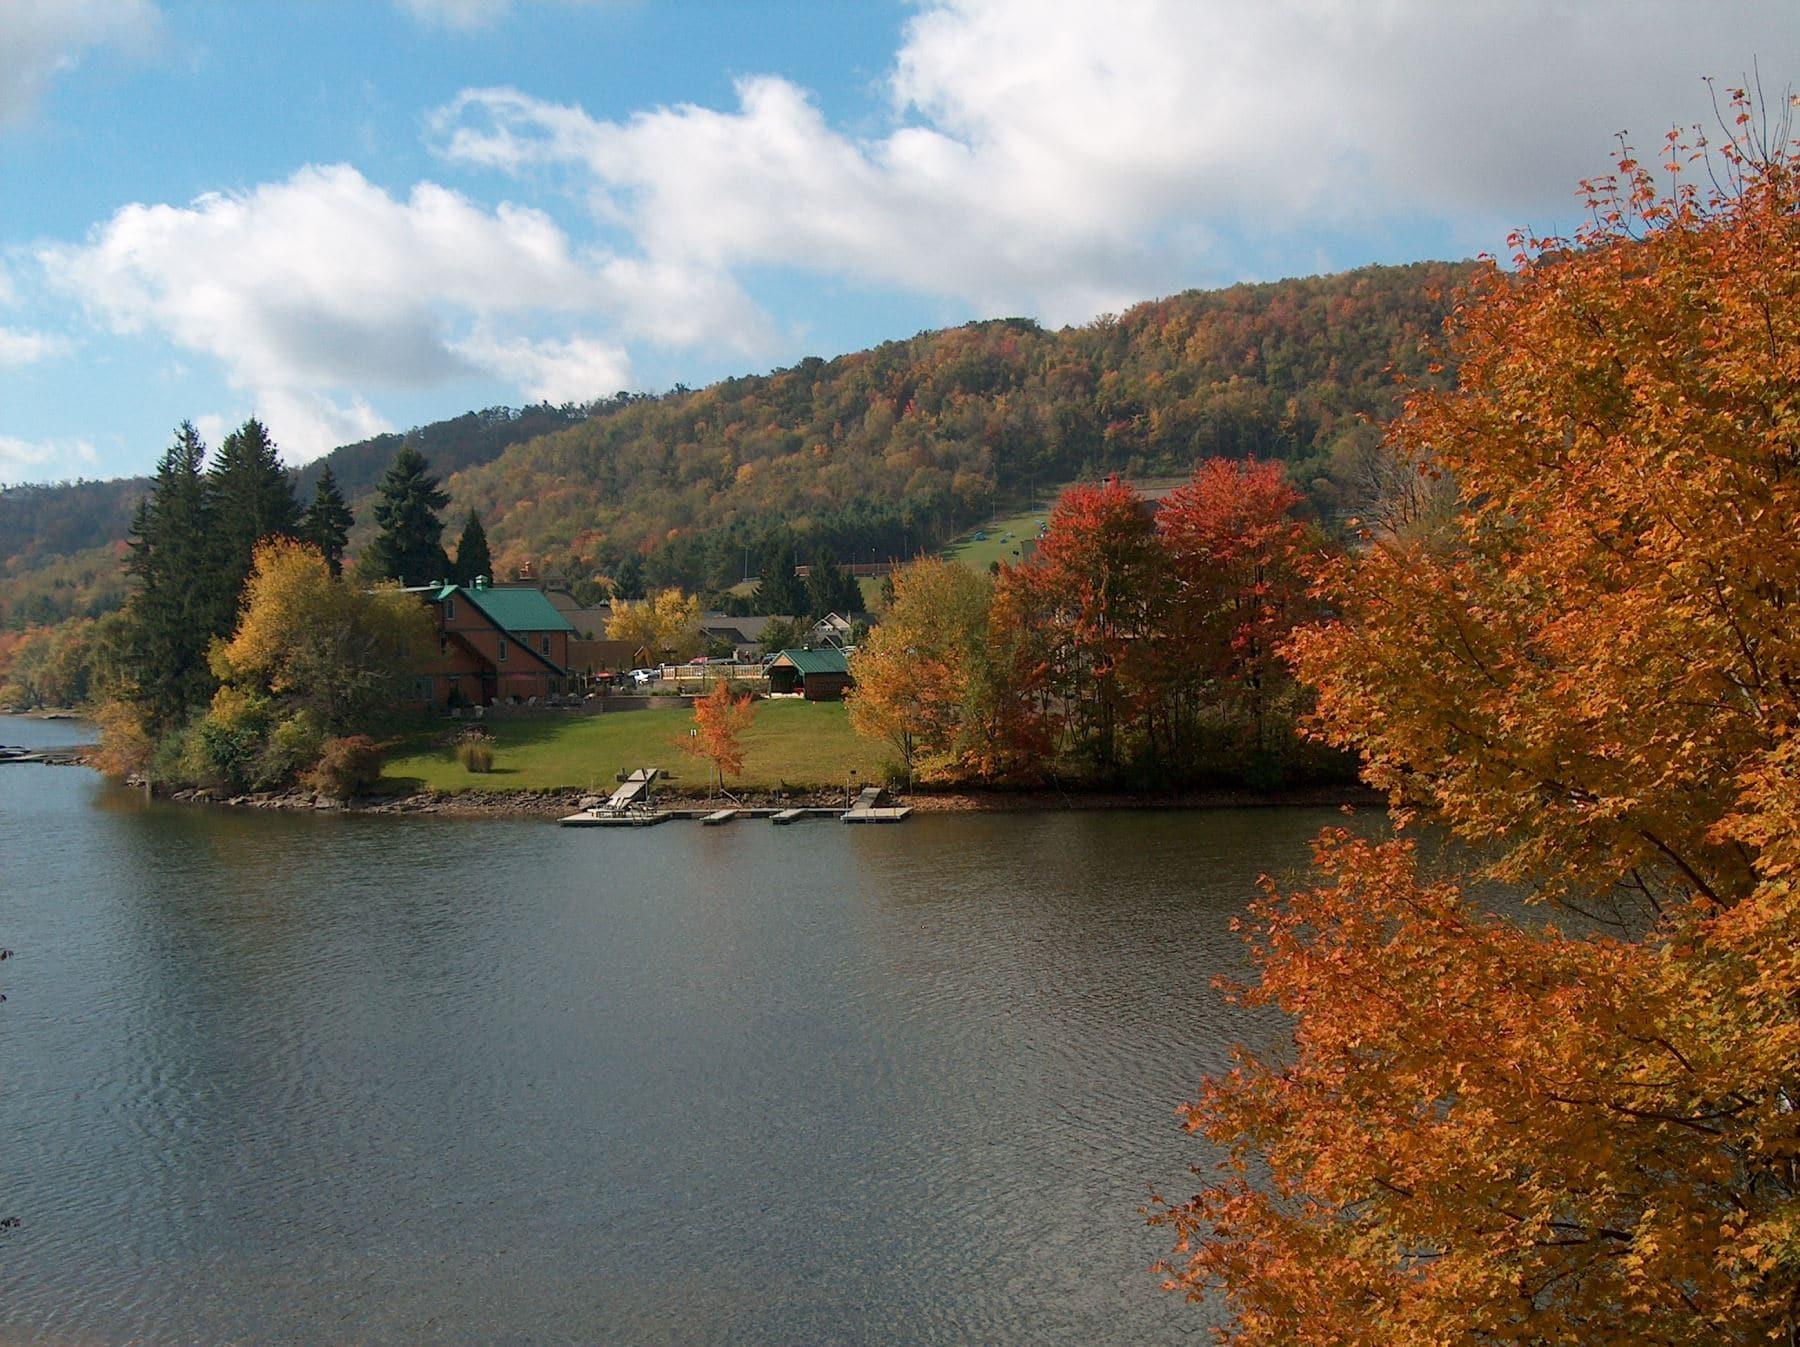 View the Best Fall Foliage Near Deep Creak Lake